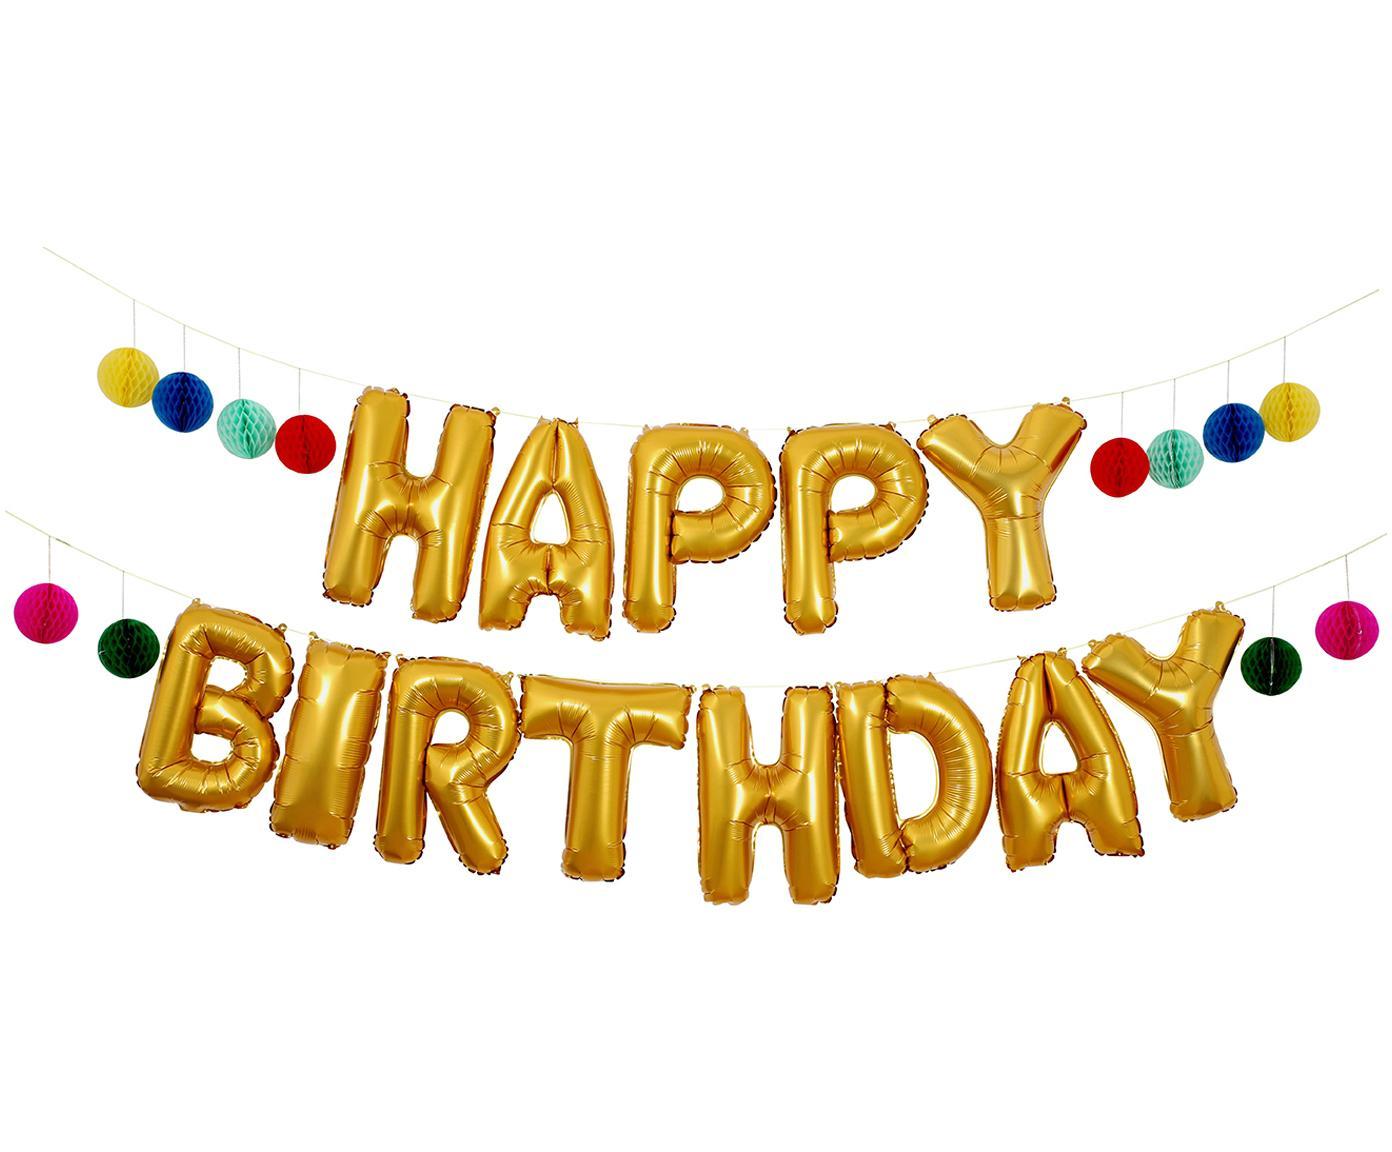 Happy birthday girlande ausdrucken